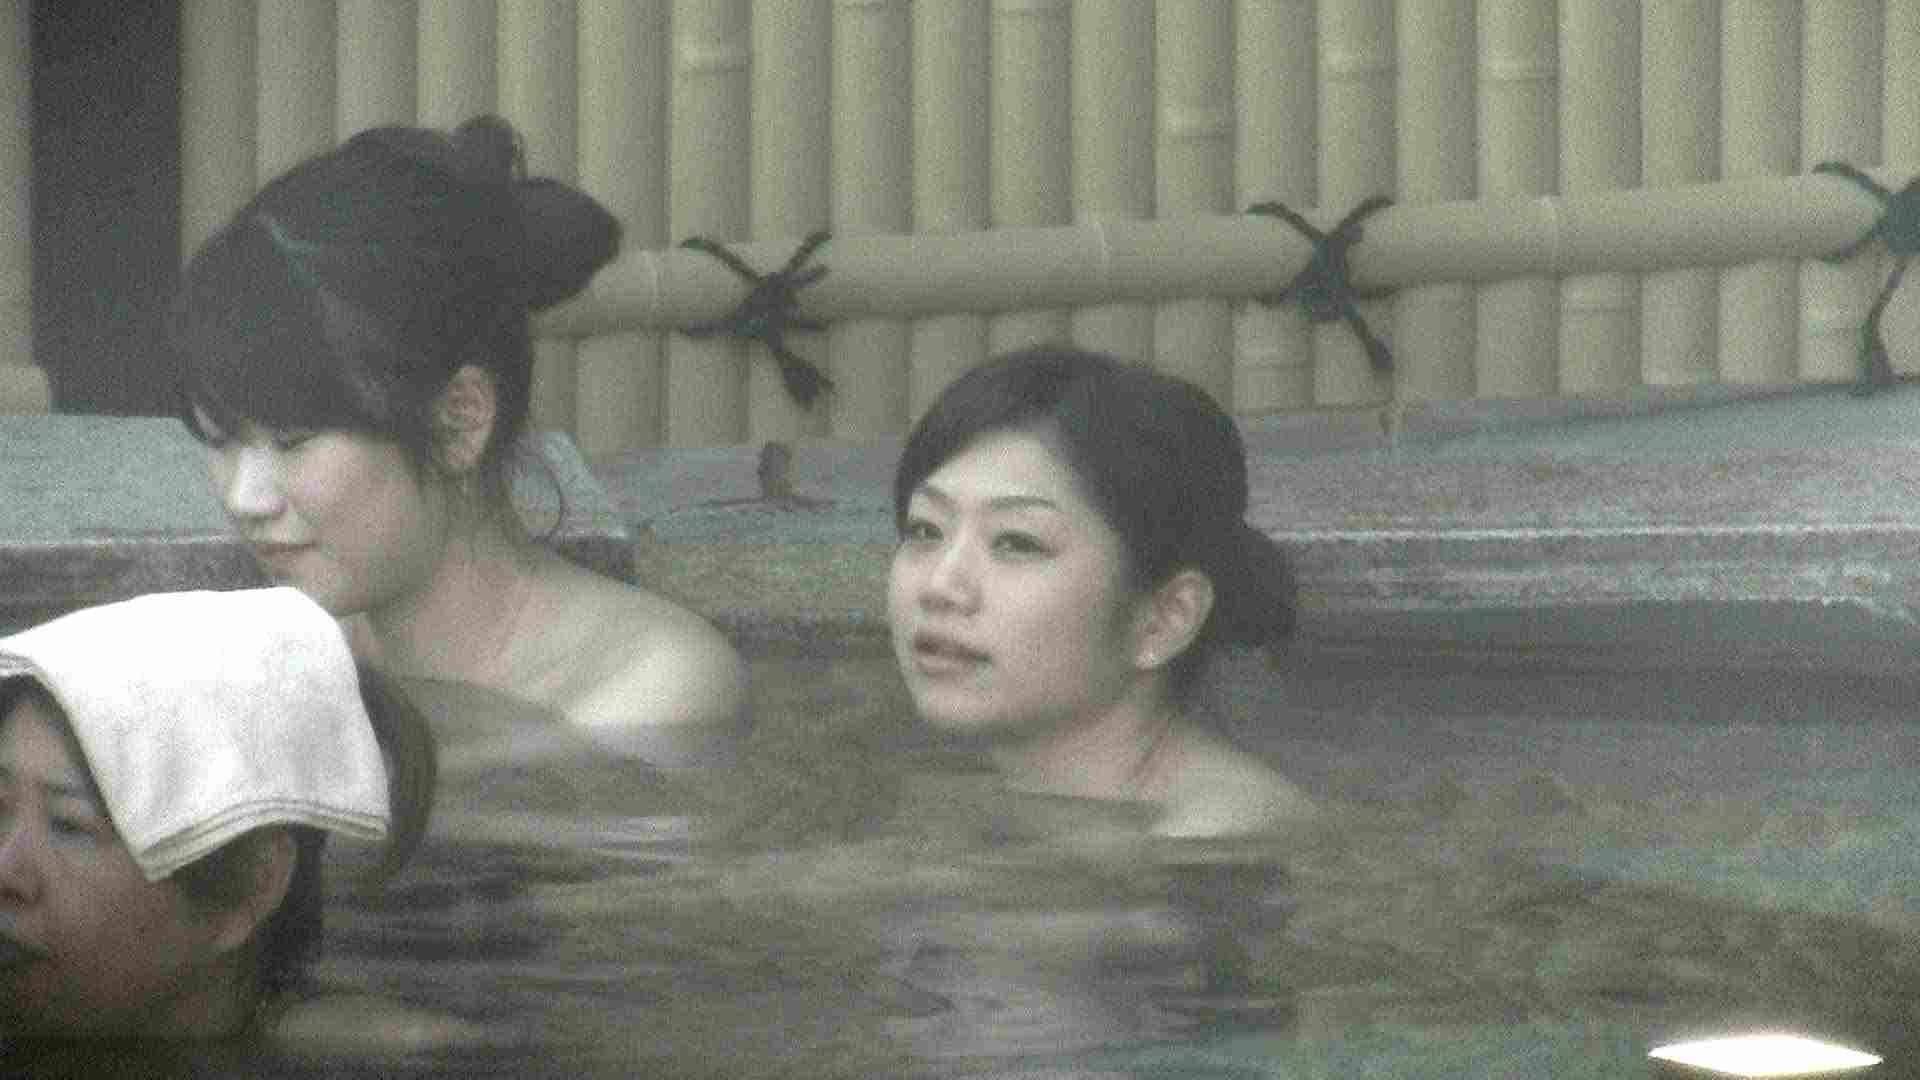 Aquaな露天風呂Vol.206 盗撮シリーズ | 露天風呂編  80PIX 29